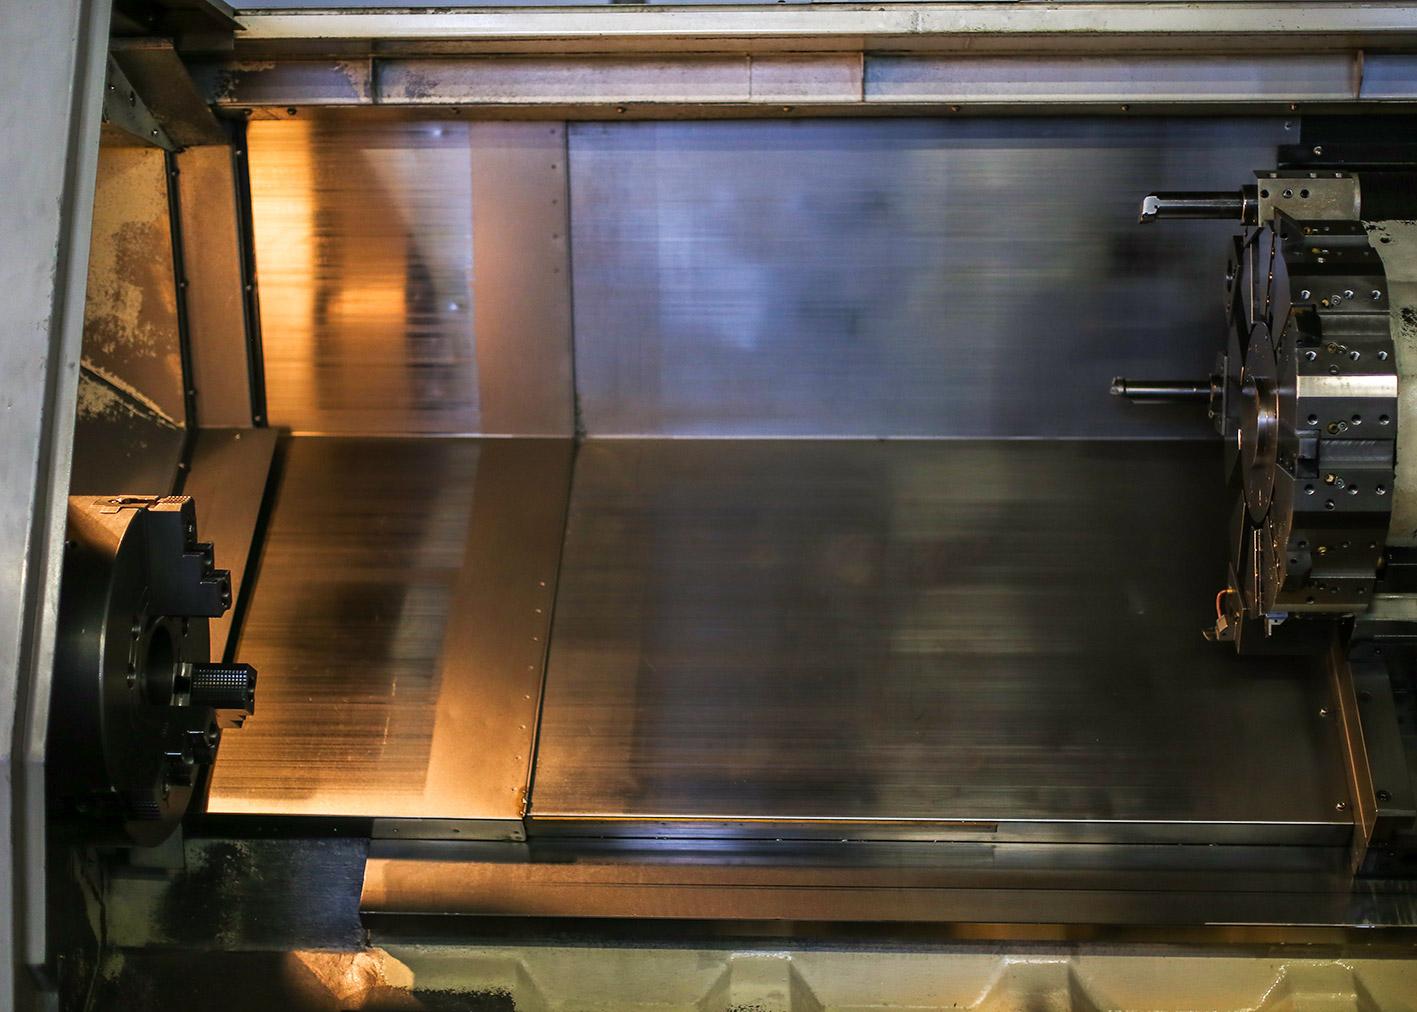 daewoo puma 400L tournage atelier reco mecanique valais salgesch